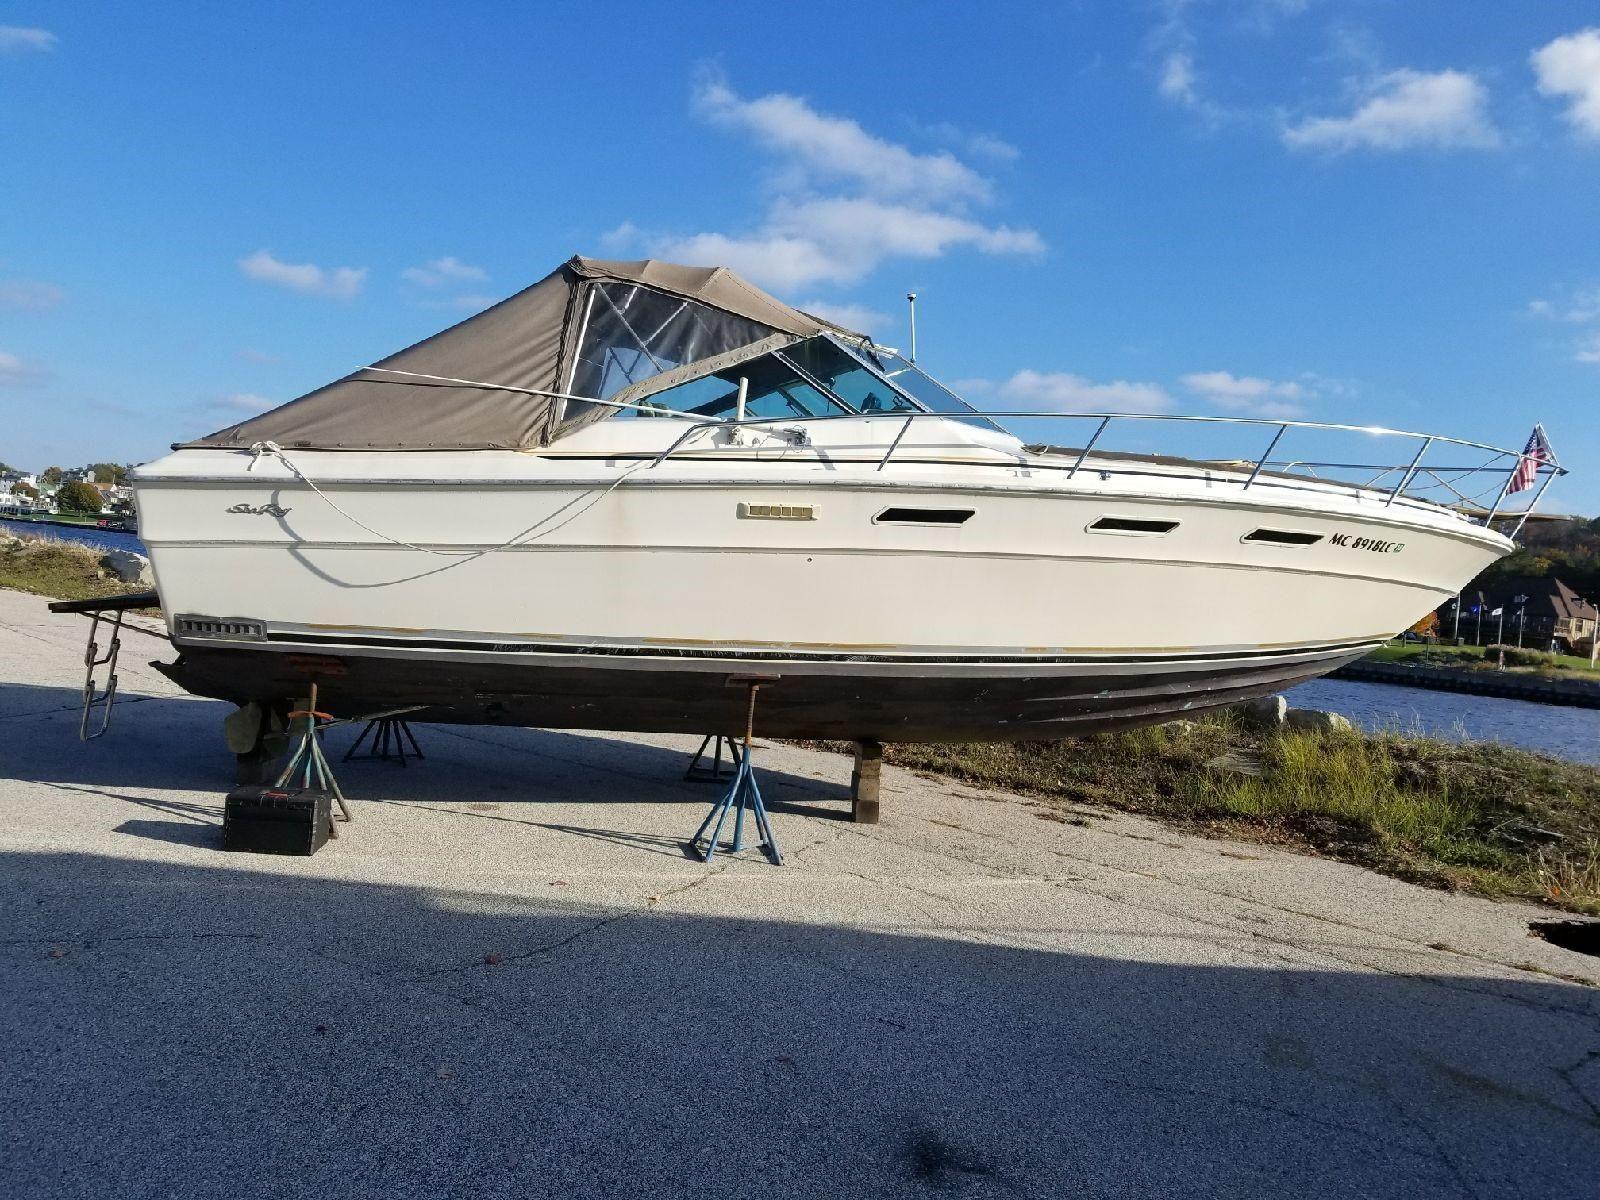 1978 Sea Ray 300 Weekender Power Boat For Sale - www ...